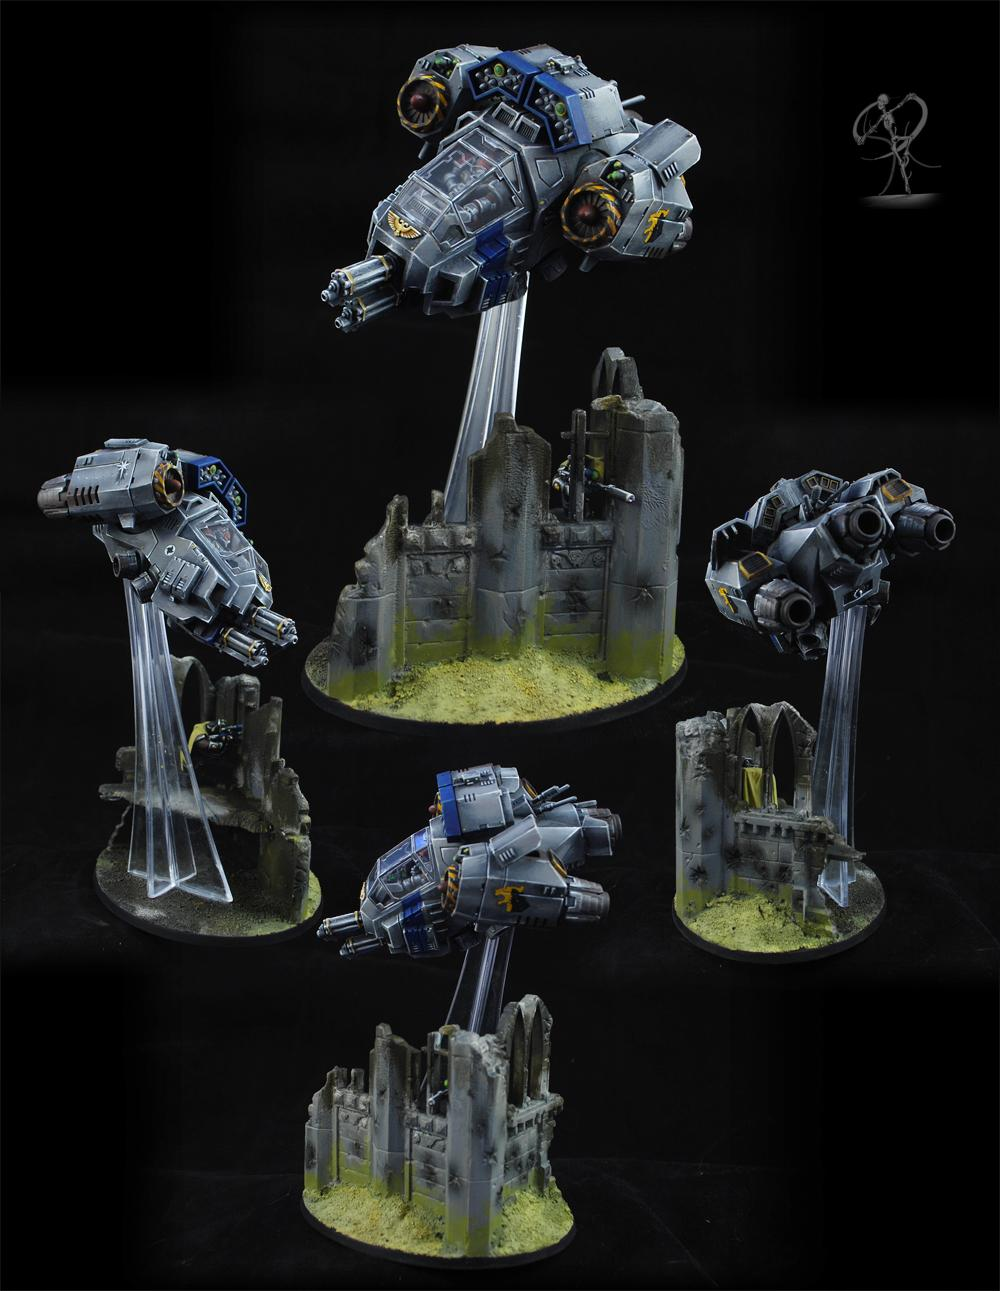 Aircraft, Badab, Base, Conversion, Non-Metallic Metal, Ruins, Space Marines, Vehicle, Warhammer 40,000